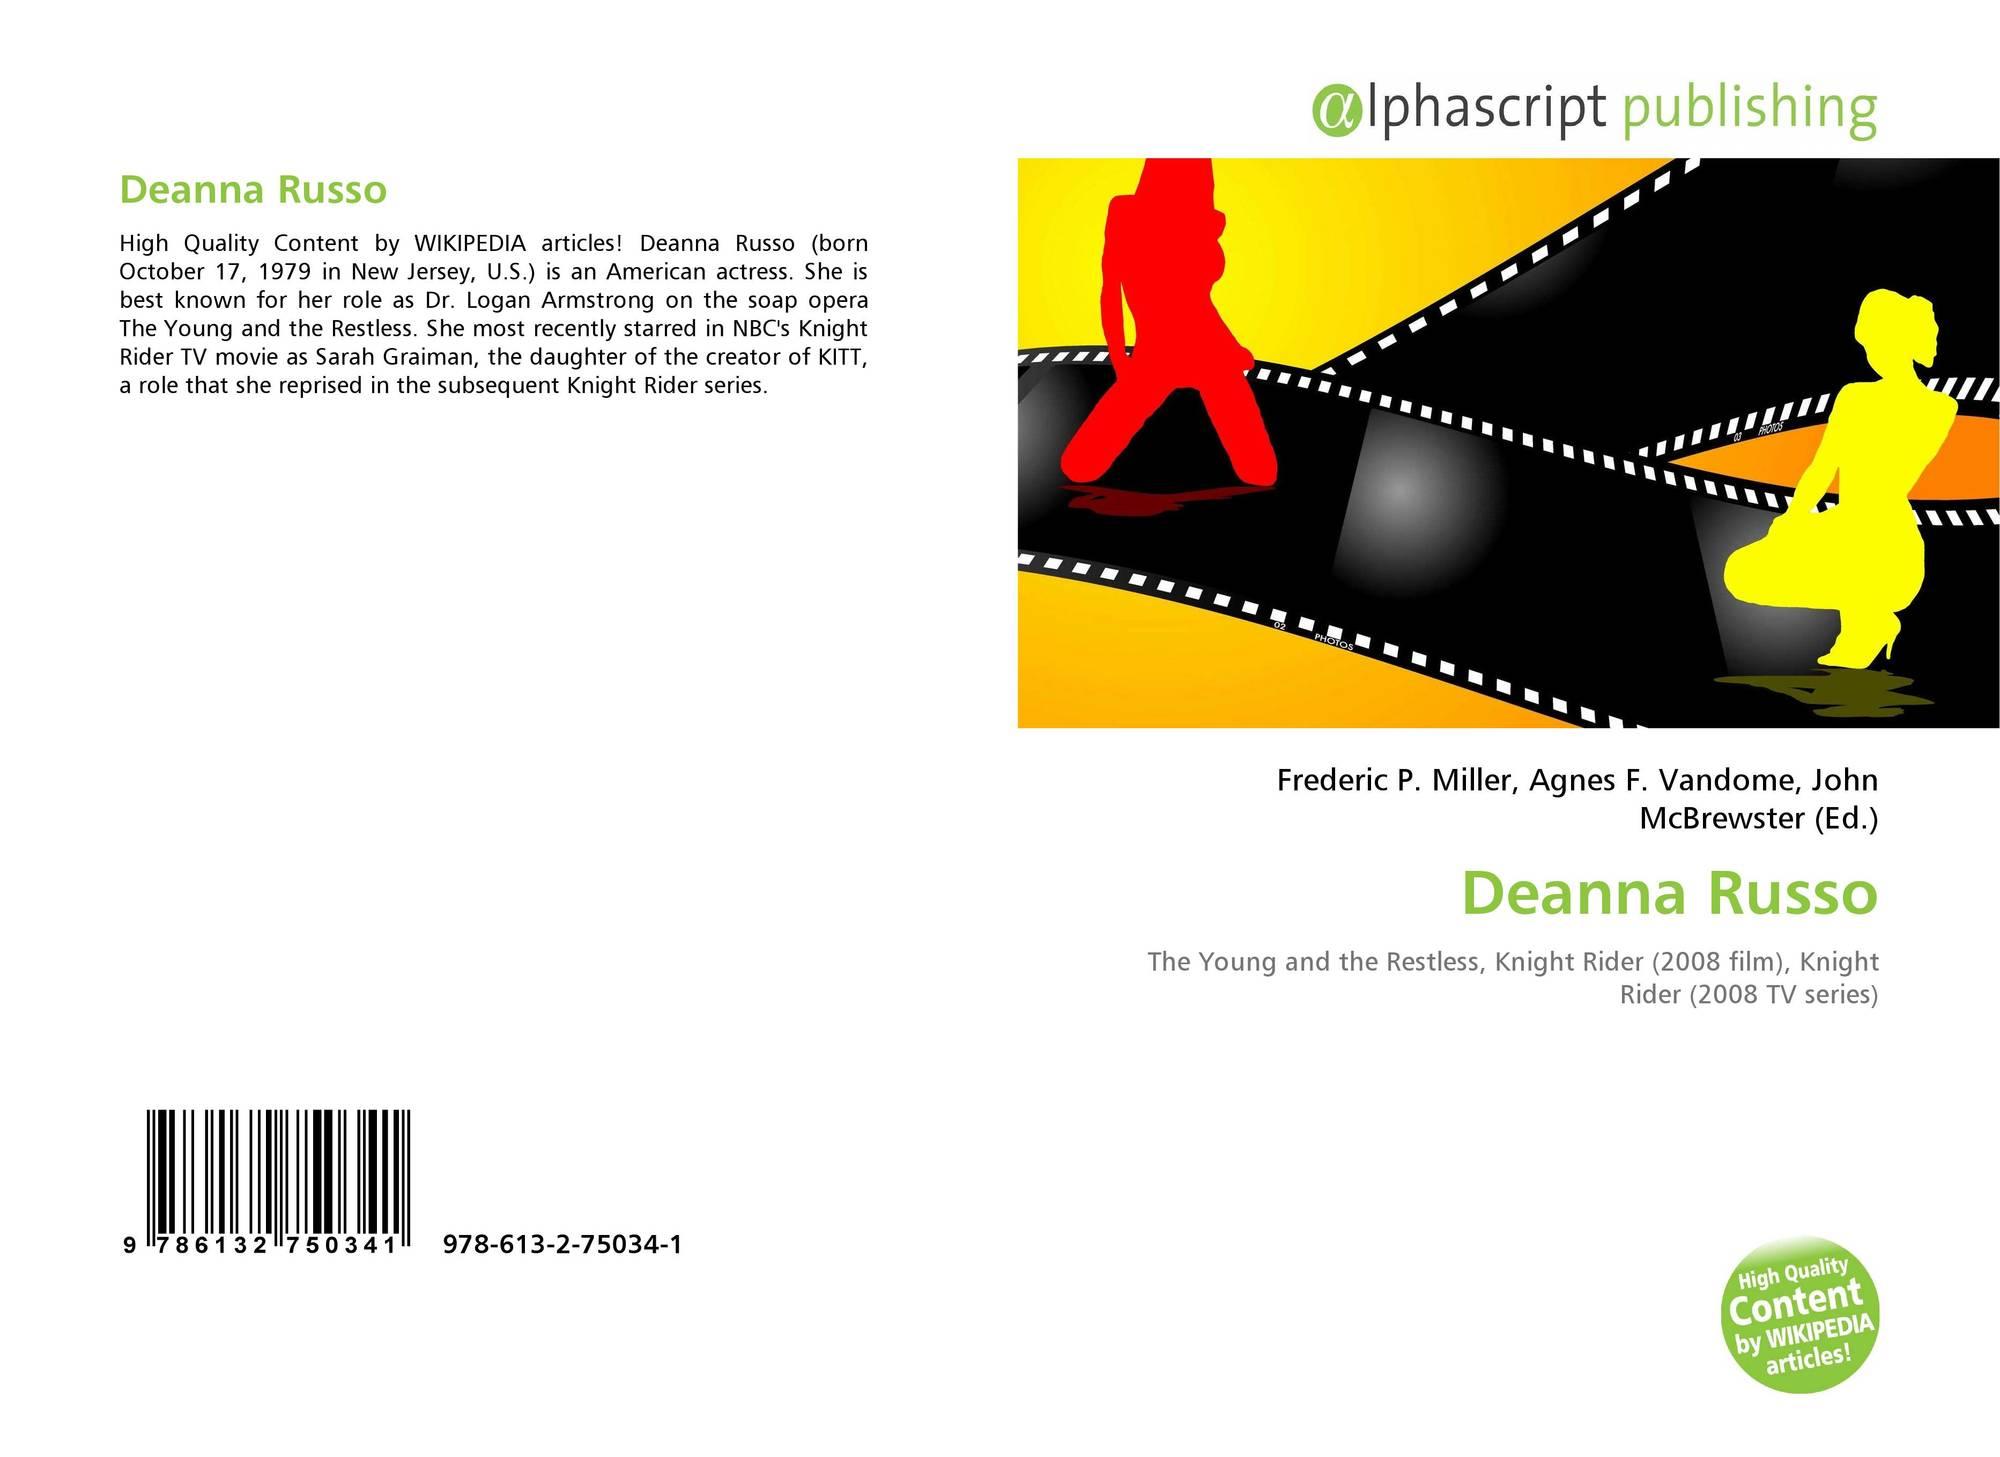 Deanna Russo, 978-613-2-75034-1, 6132750347 ,9786132750341